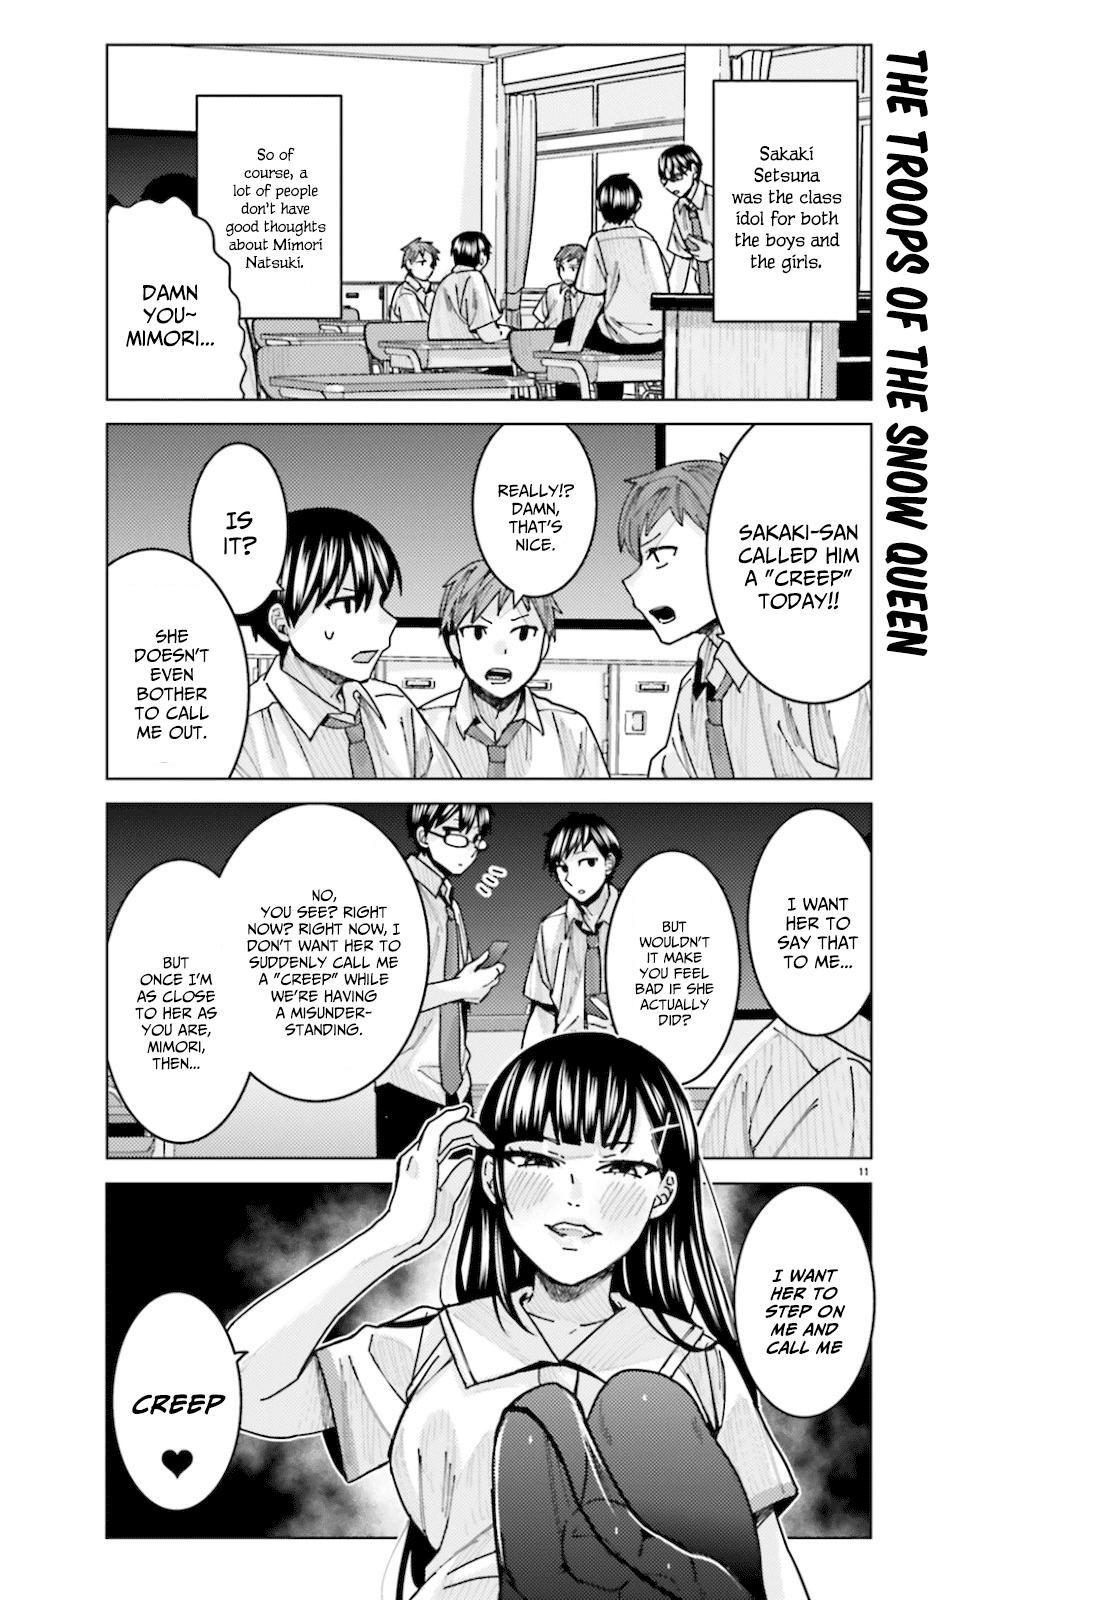 Himegasaki Sakurako Wa Kyoumo Fubin Kawaii! Chapter 11 page 11 - Mangakakalots.com